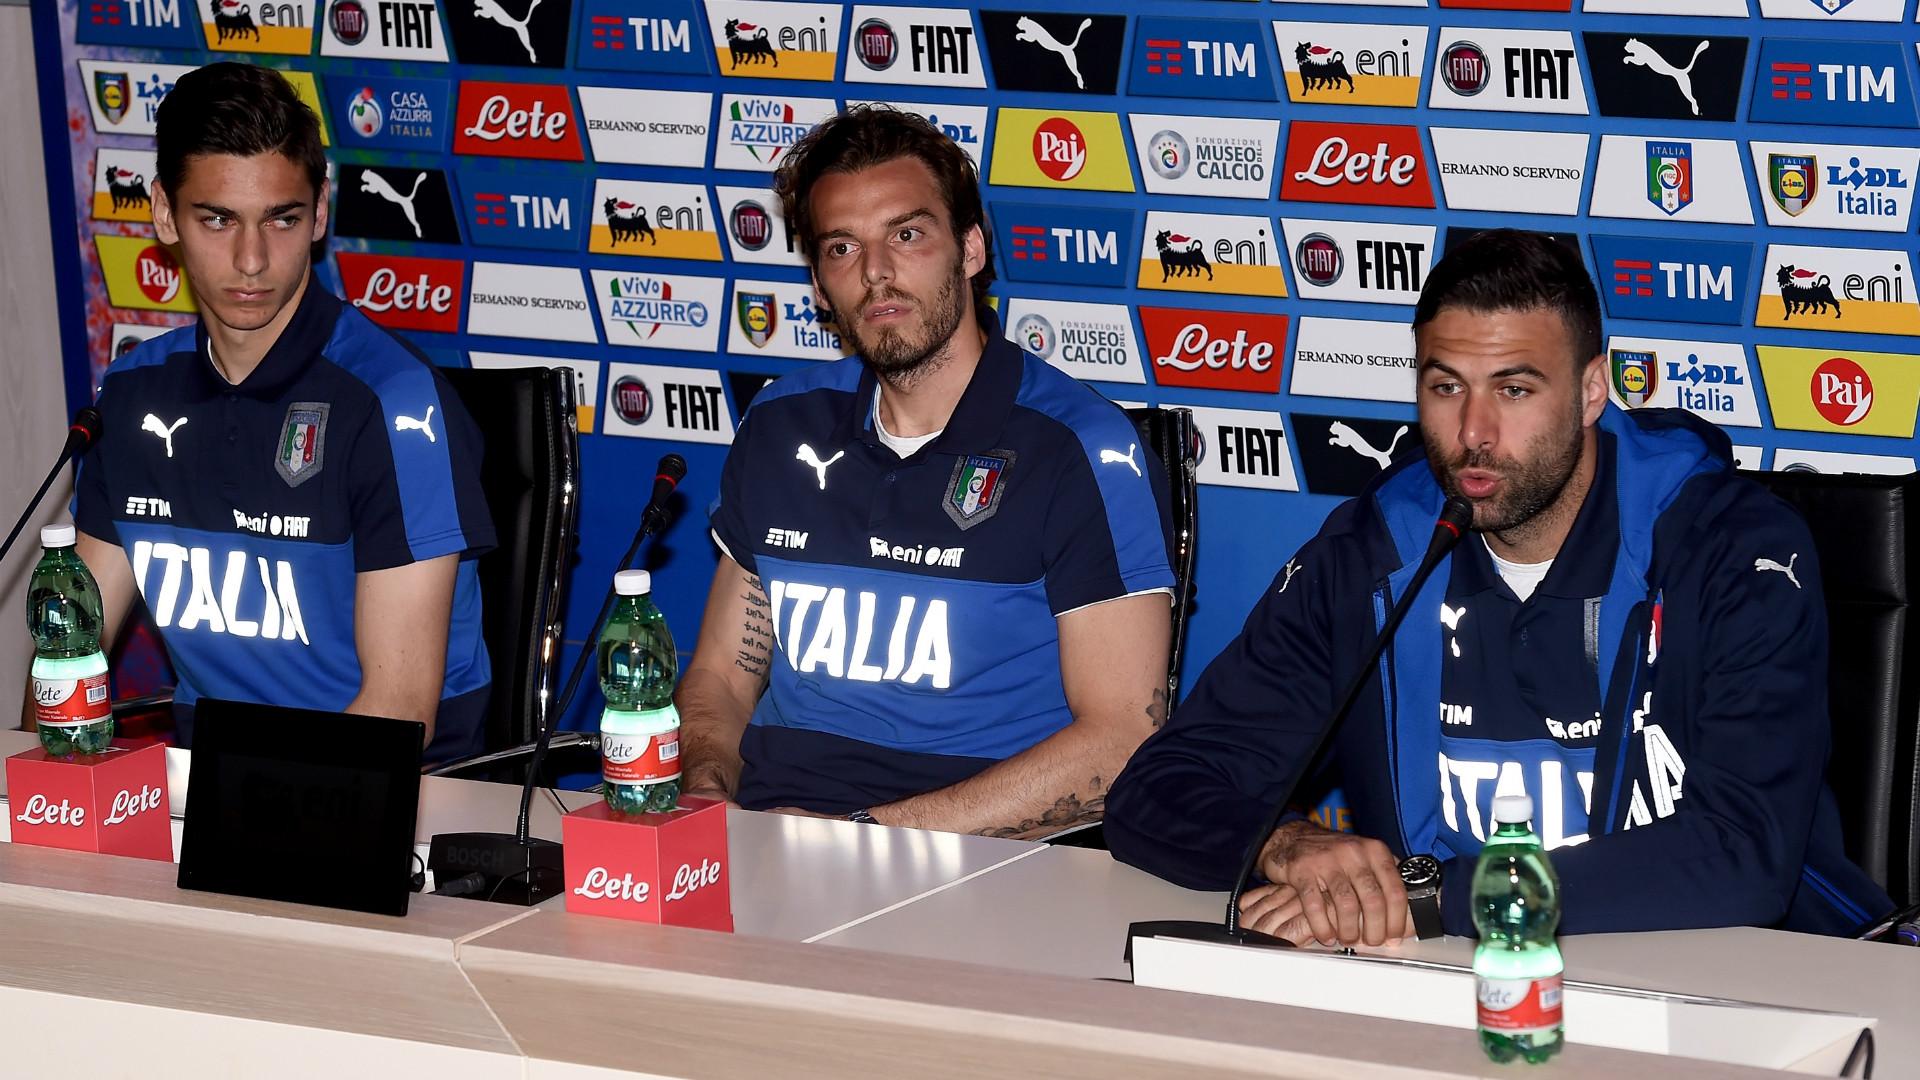 Italia, Marchetti e Sirigu: